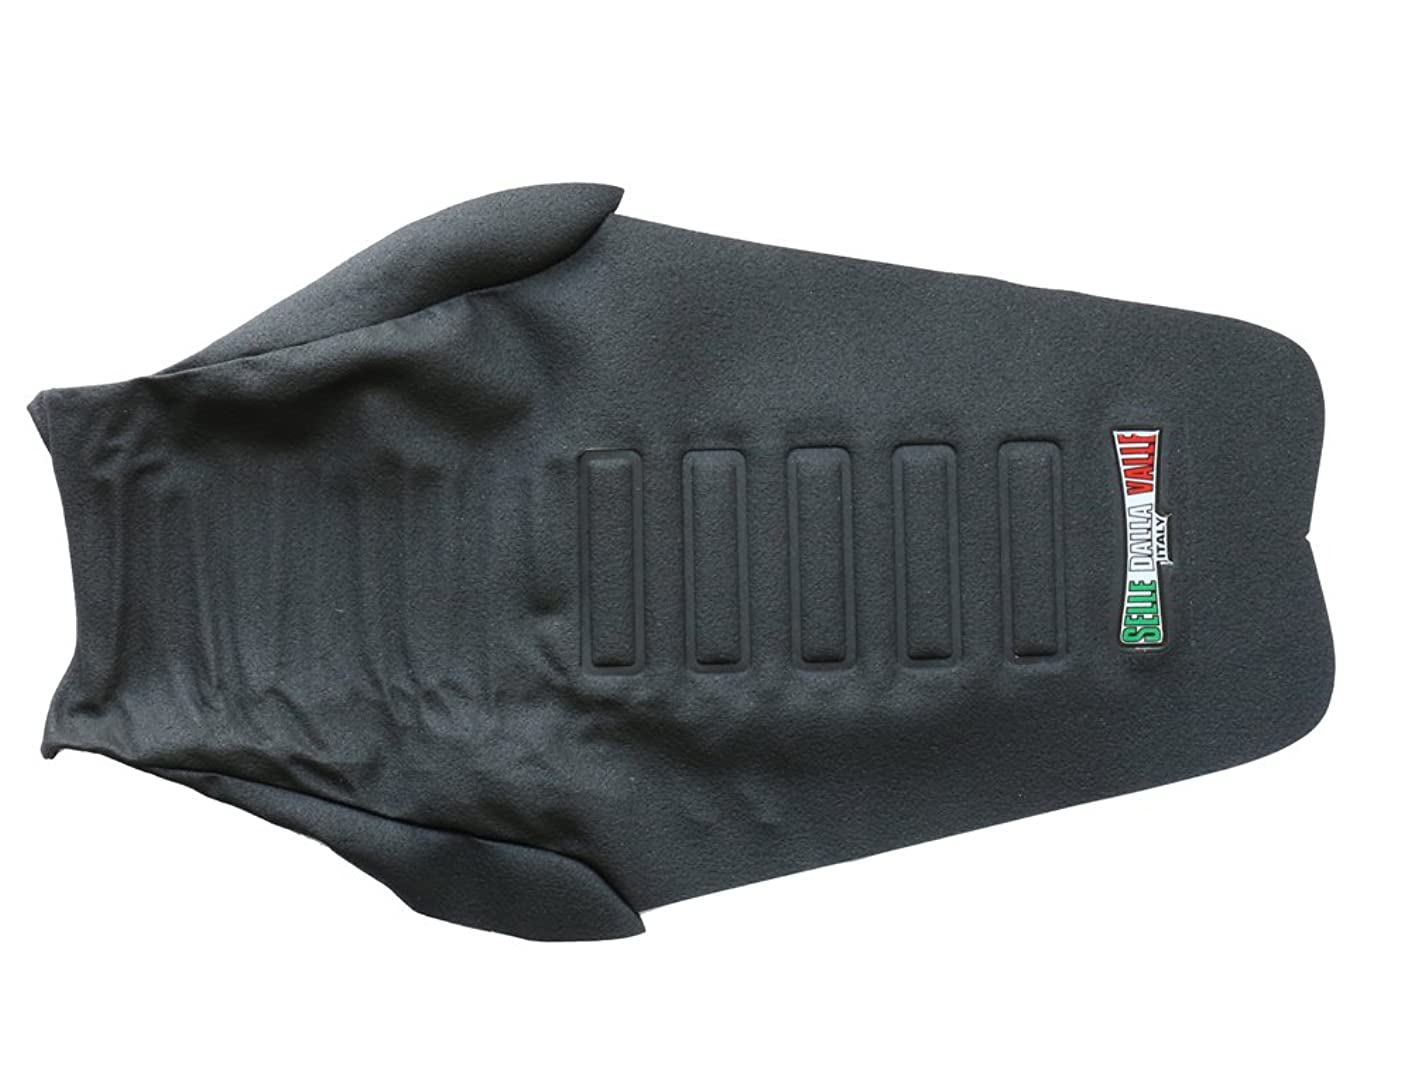 Athena SDV003W Seat Cover (Wave)